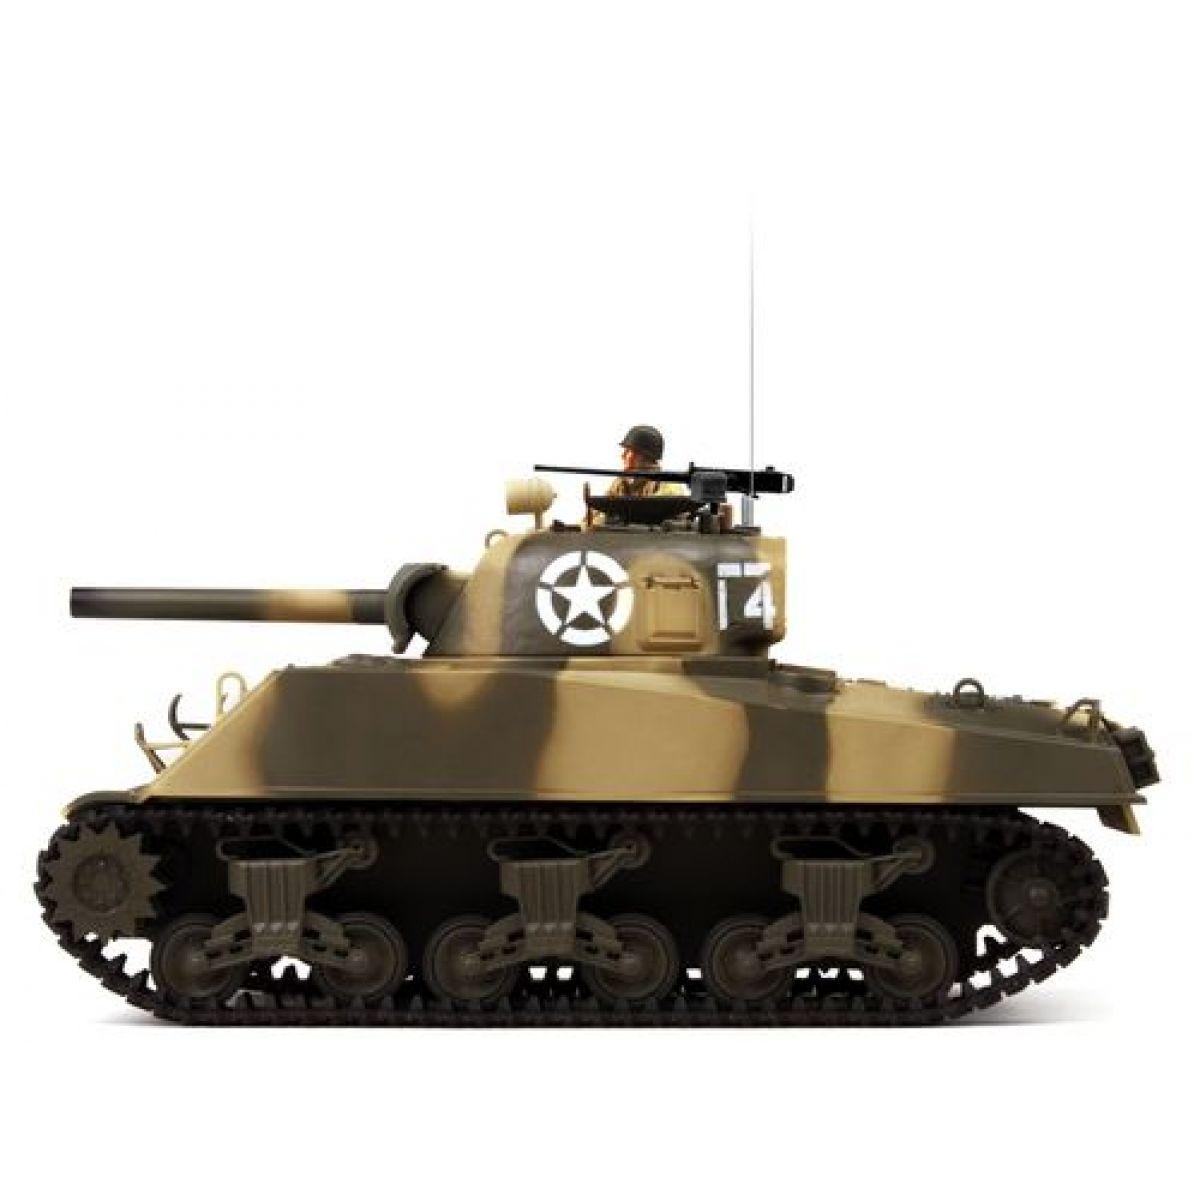 VsTank PRO IR GR4032_07672 - U.S.M4 Sherman Desert